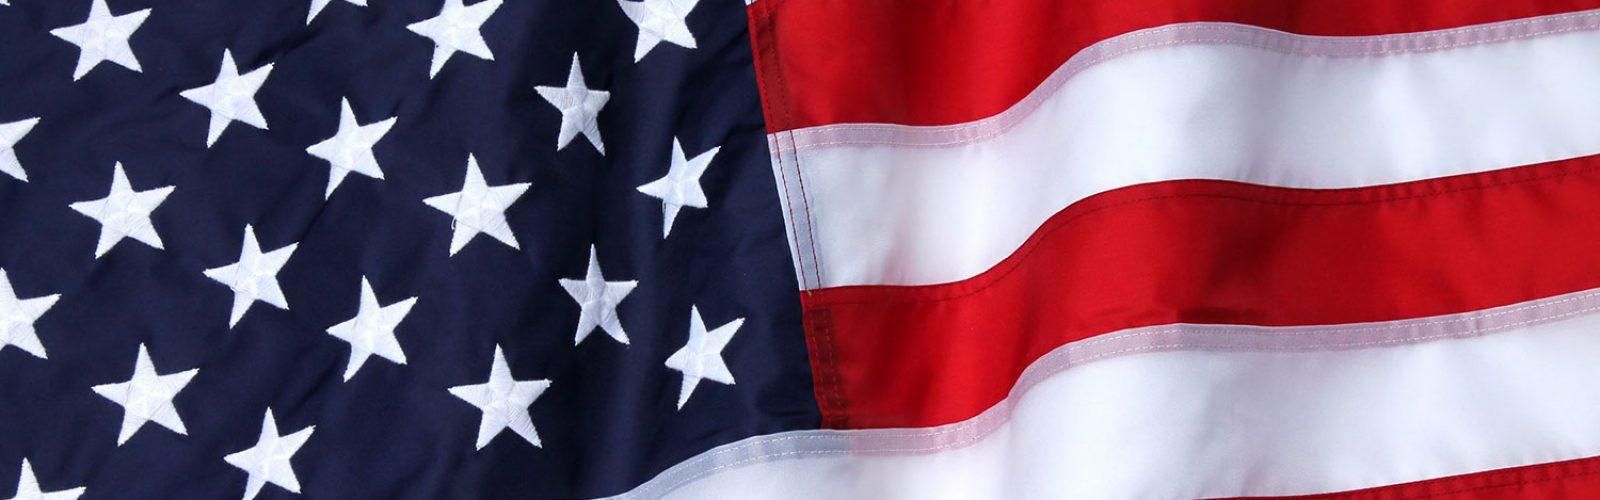 American flag rippling